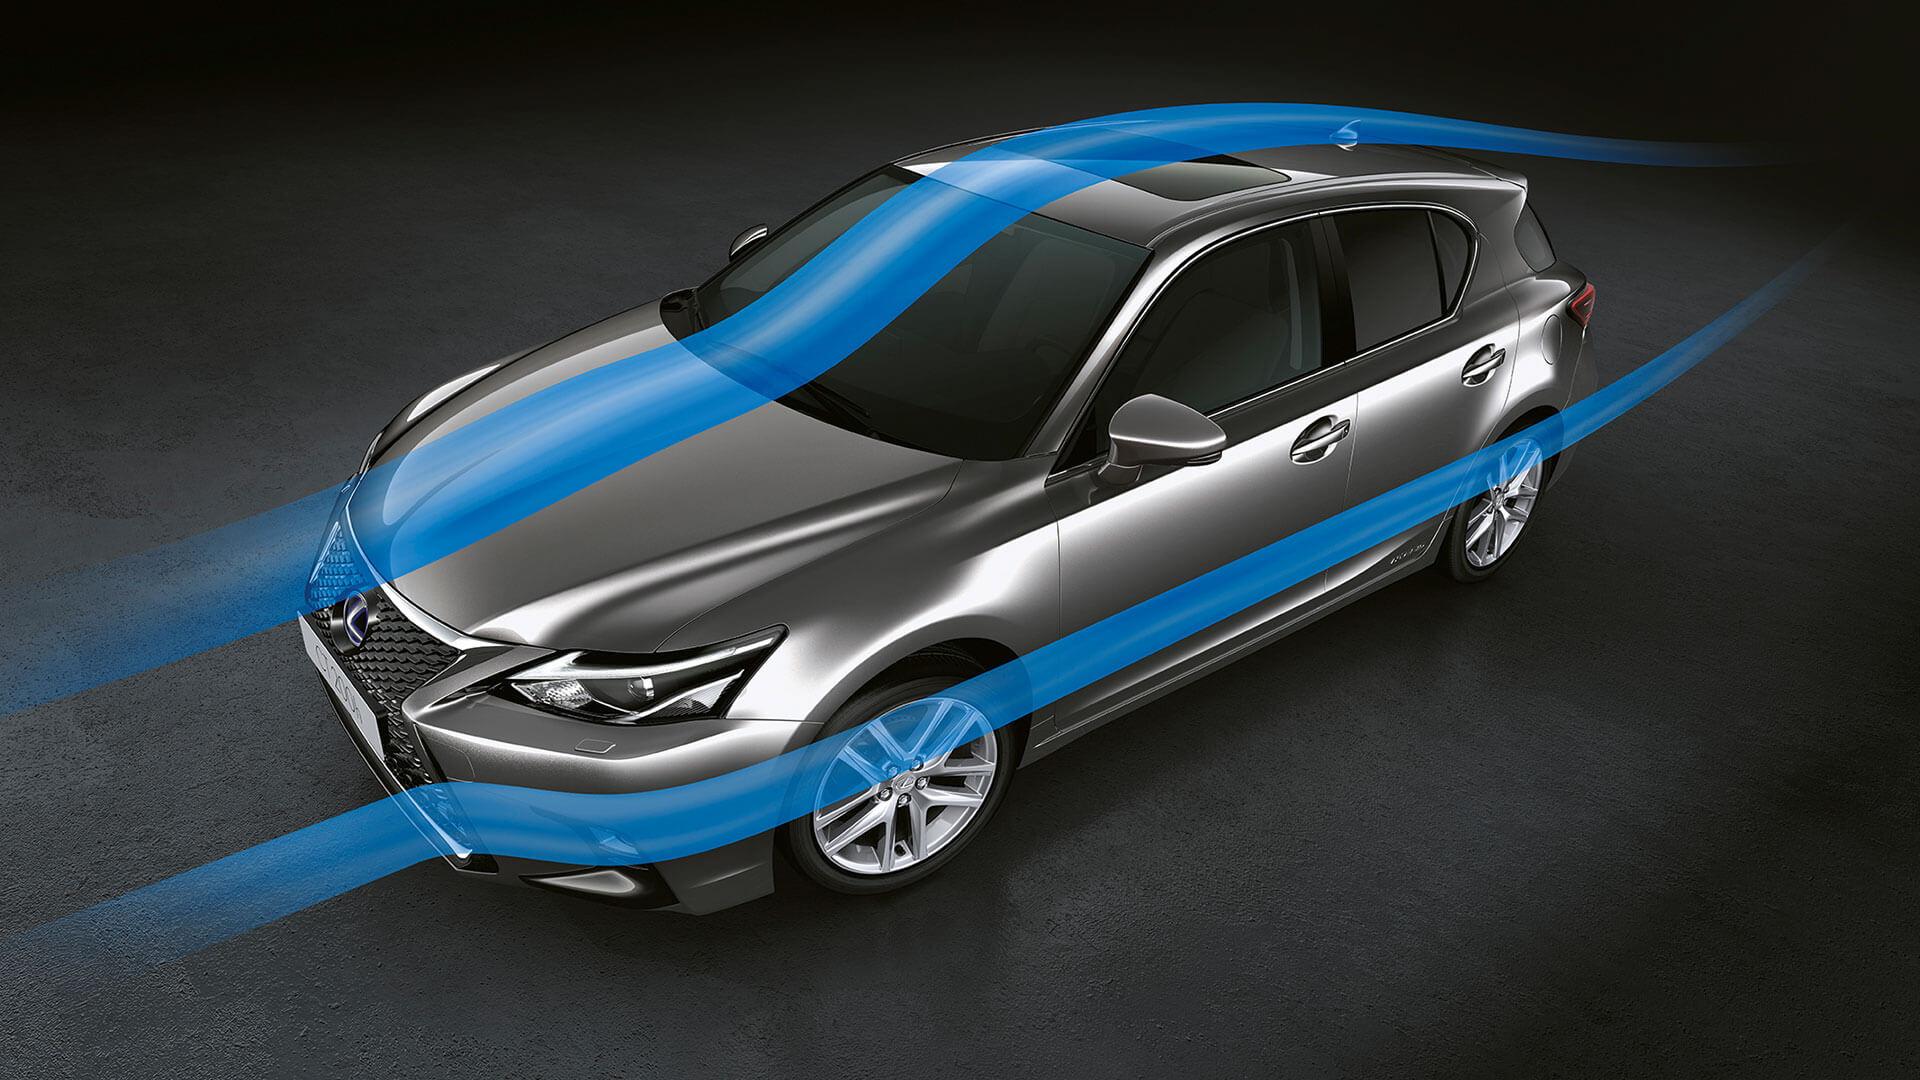 2018 lexus ct 200h my18 features aerodynamics